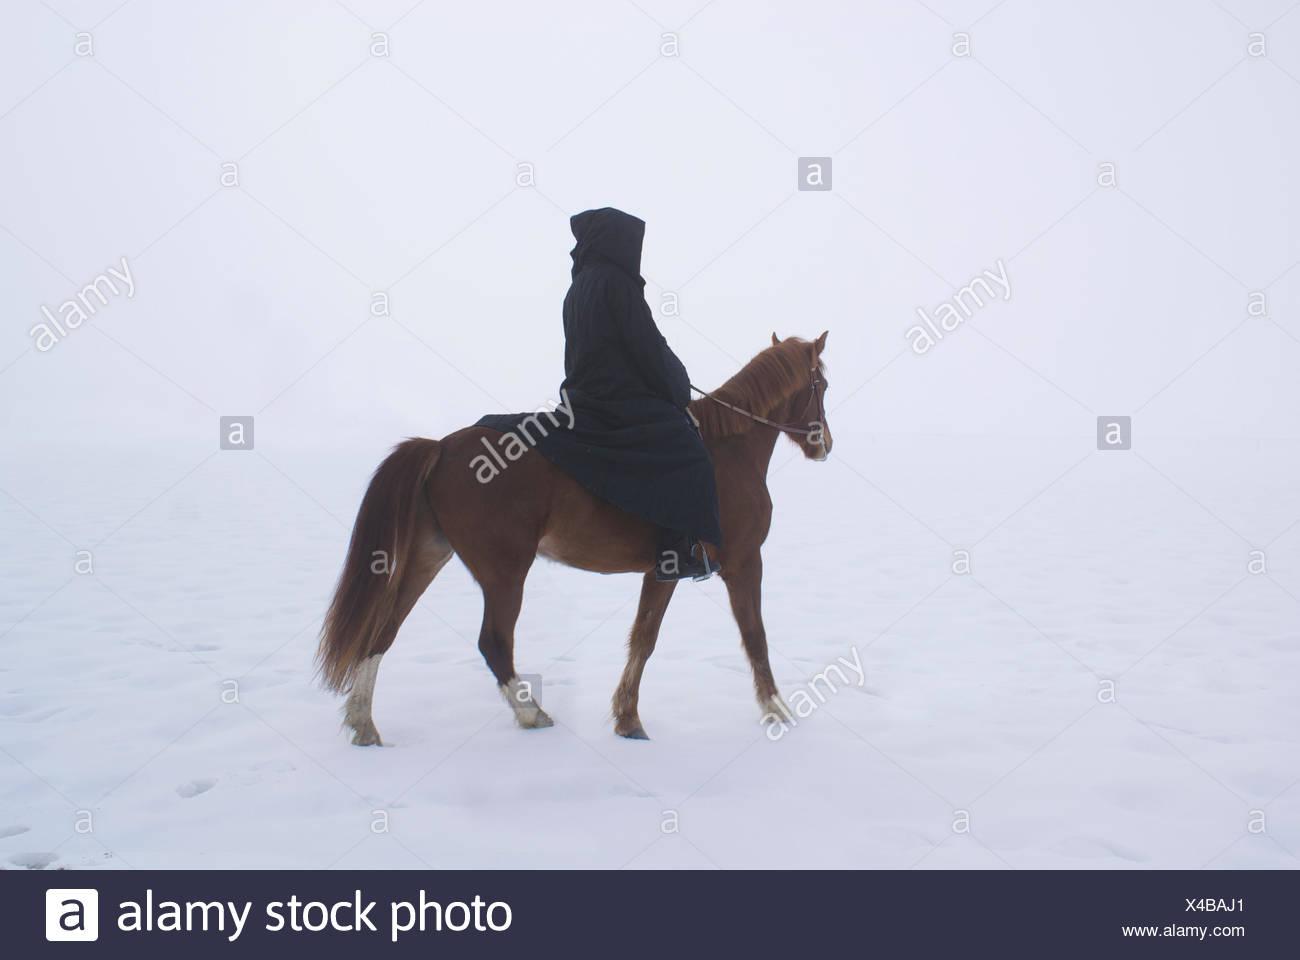 woman, horse, winter, fog, rider, equestrian, snow, woman, tree, ride, horse, Stock Photo